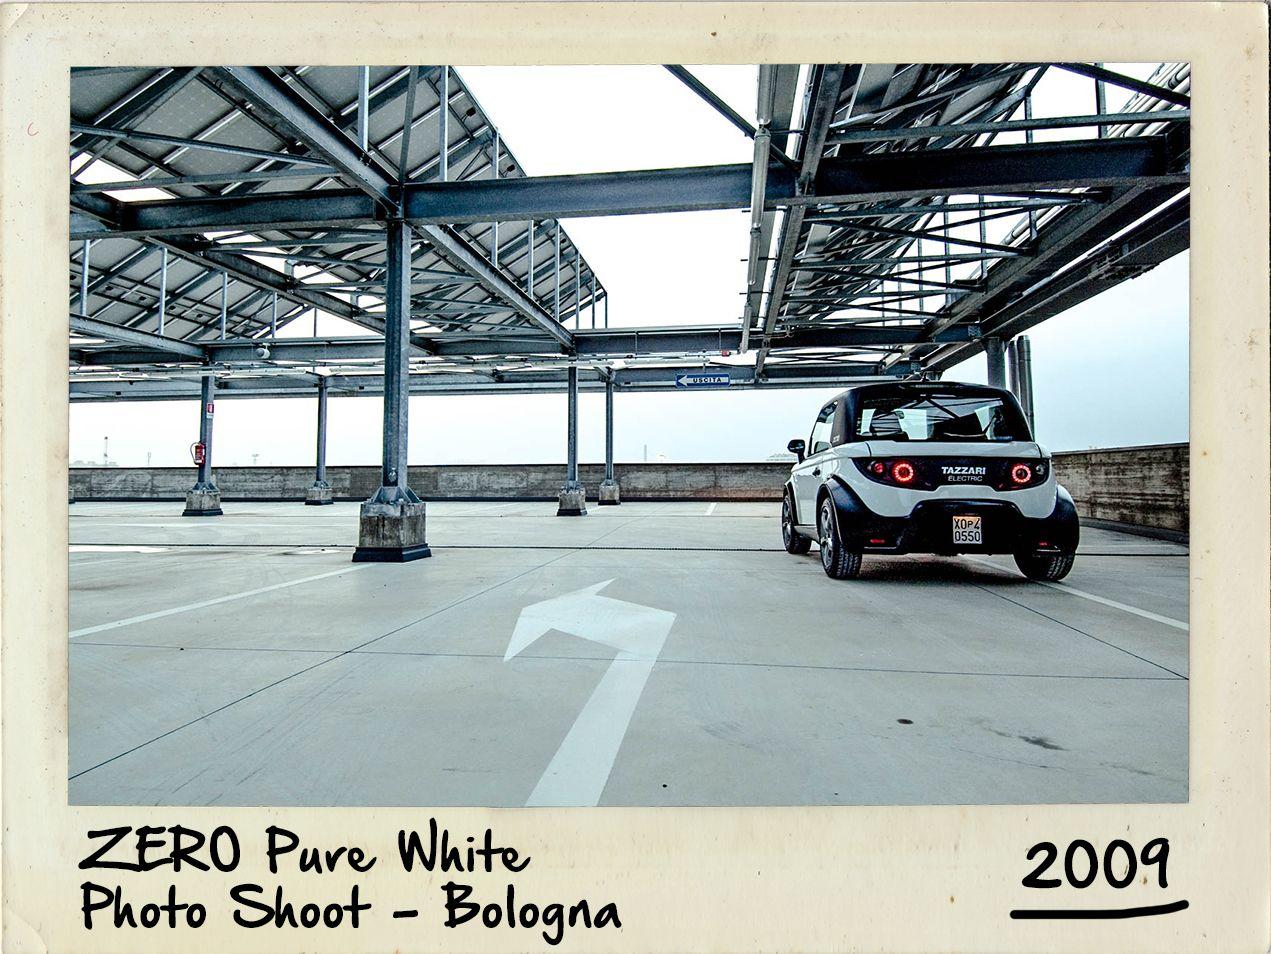 2009 PHOTO SHOOT IN BOLOGNA WWW.TAZZARI-ZERO.COM #TAZZARI #ZERO #EM1 ...